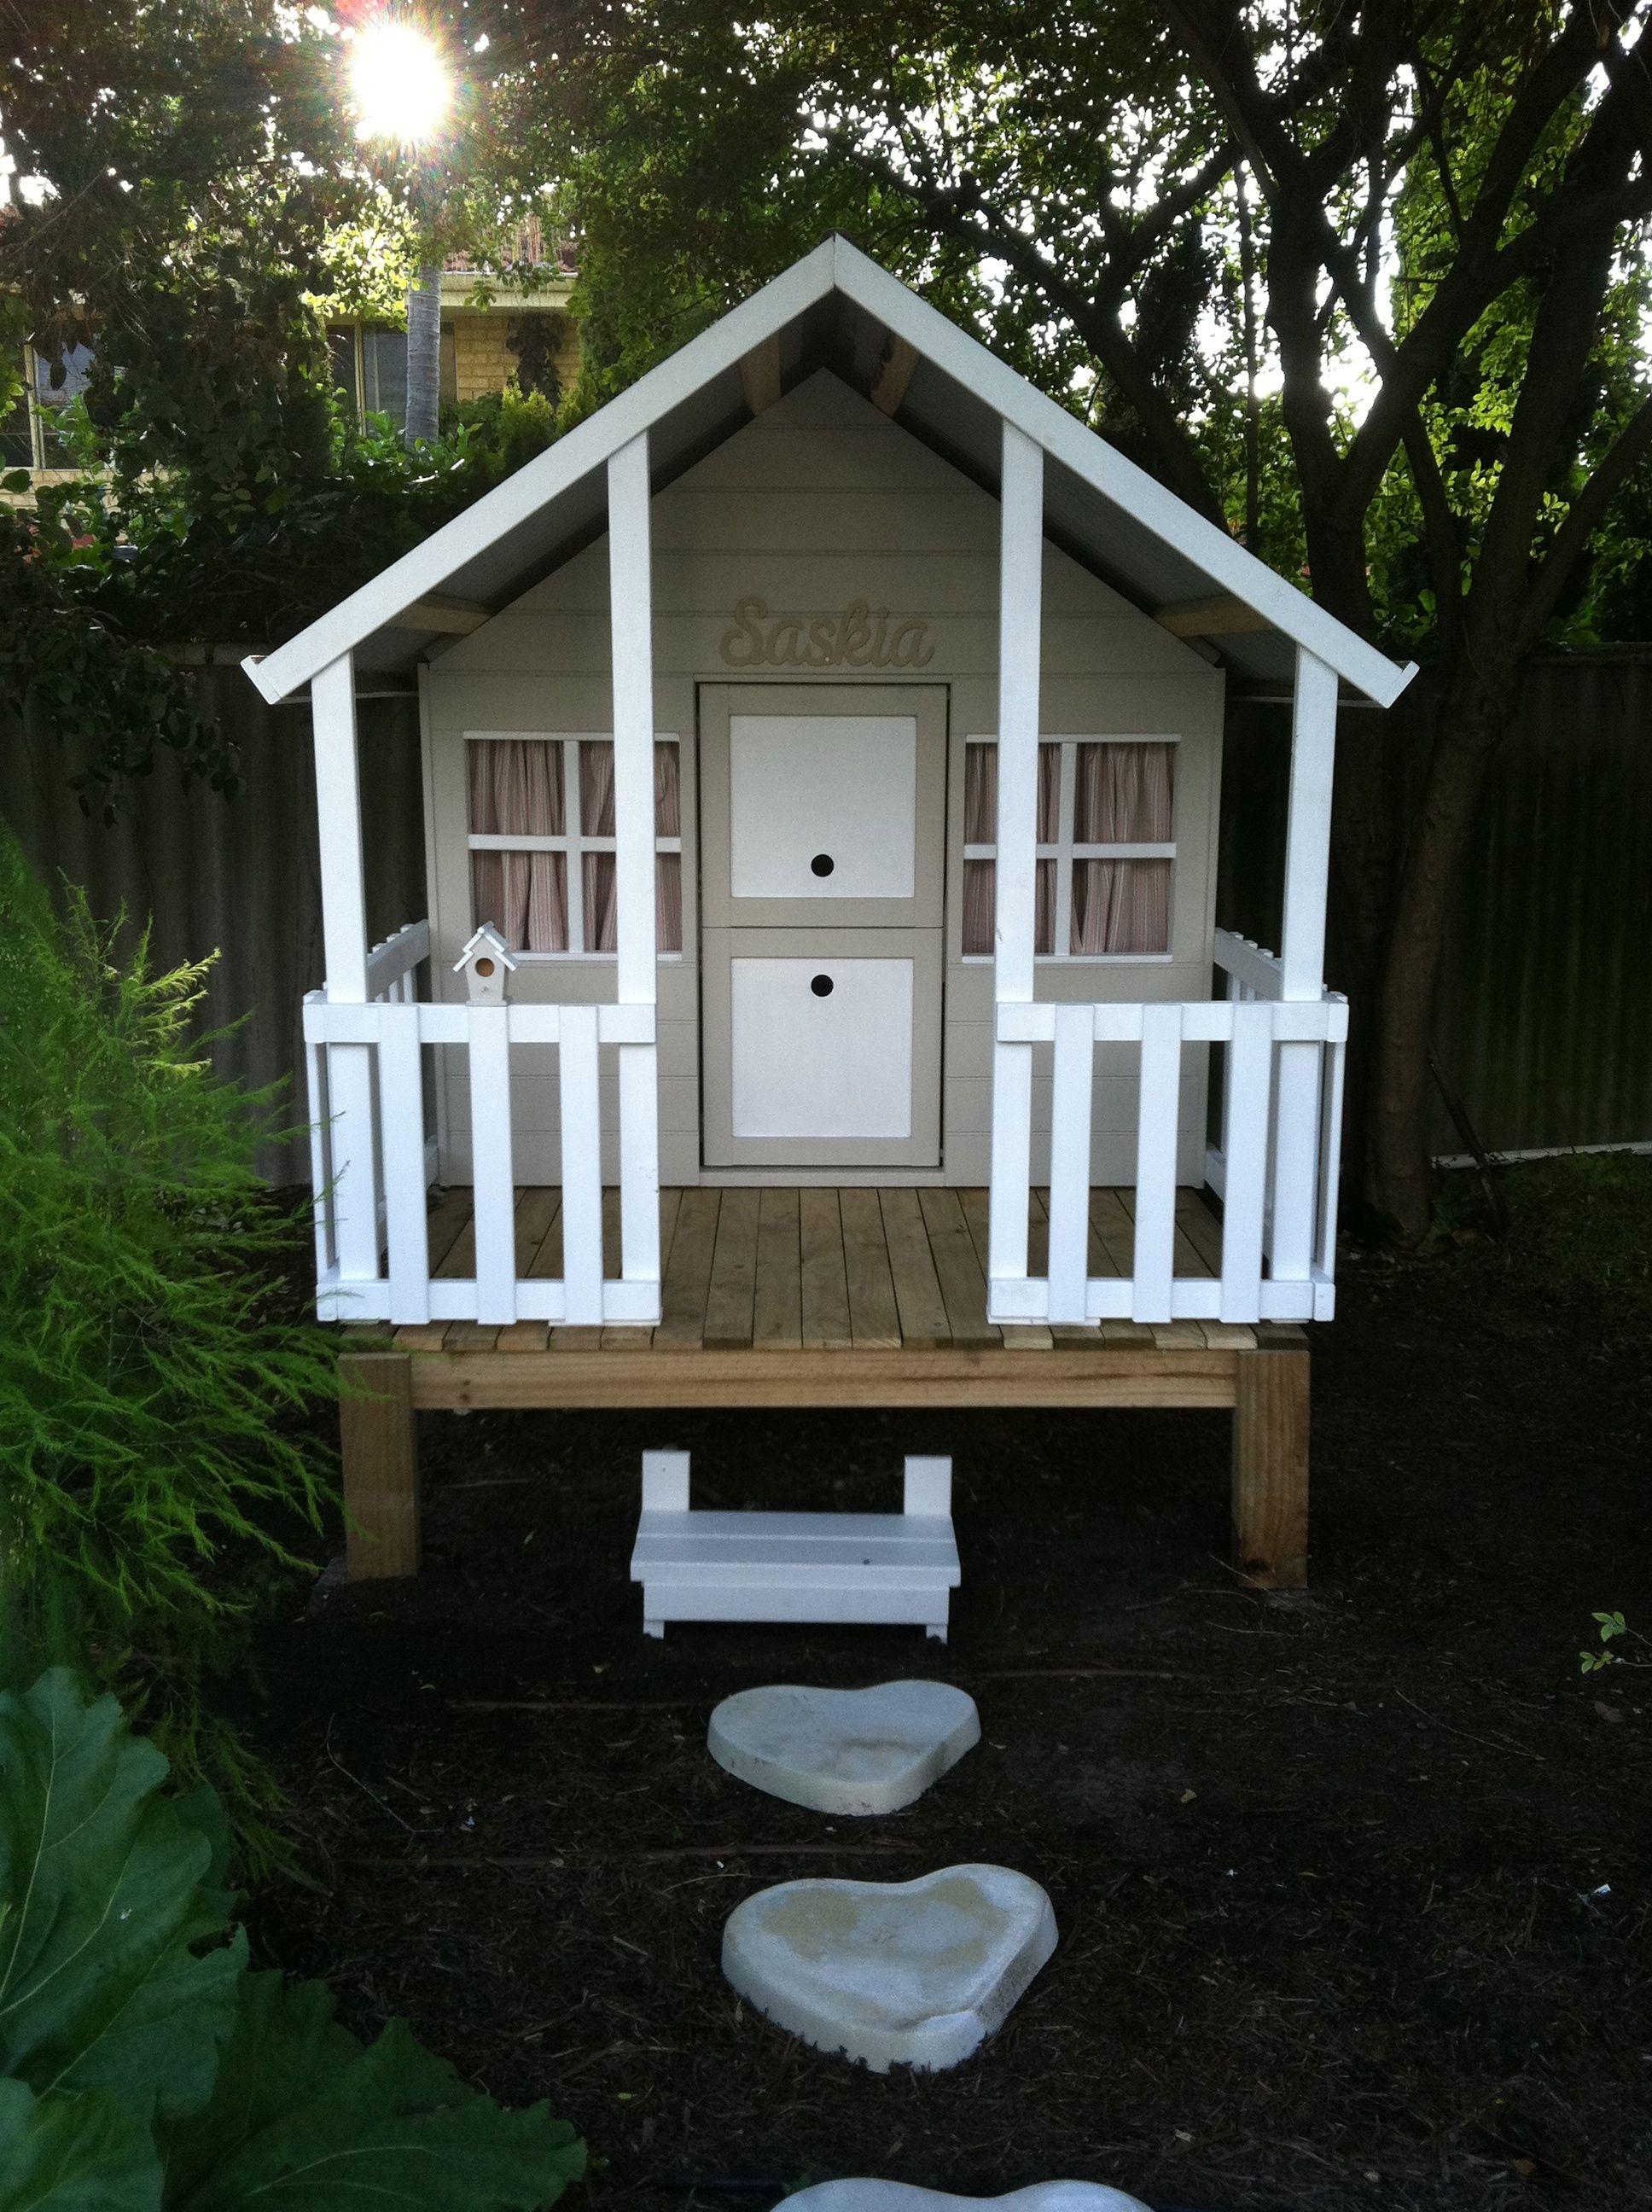 Epingle Par Sarah Hiller Sur My Style Cabane Jardin Cabane Bois Enfant Plan Cabane En Bois